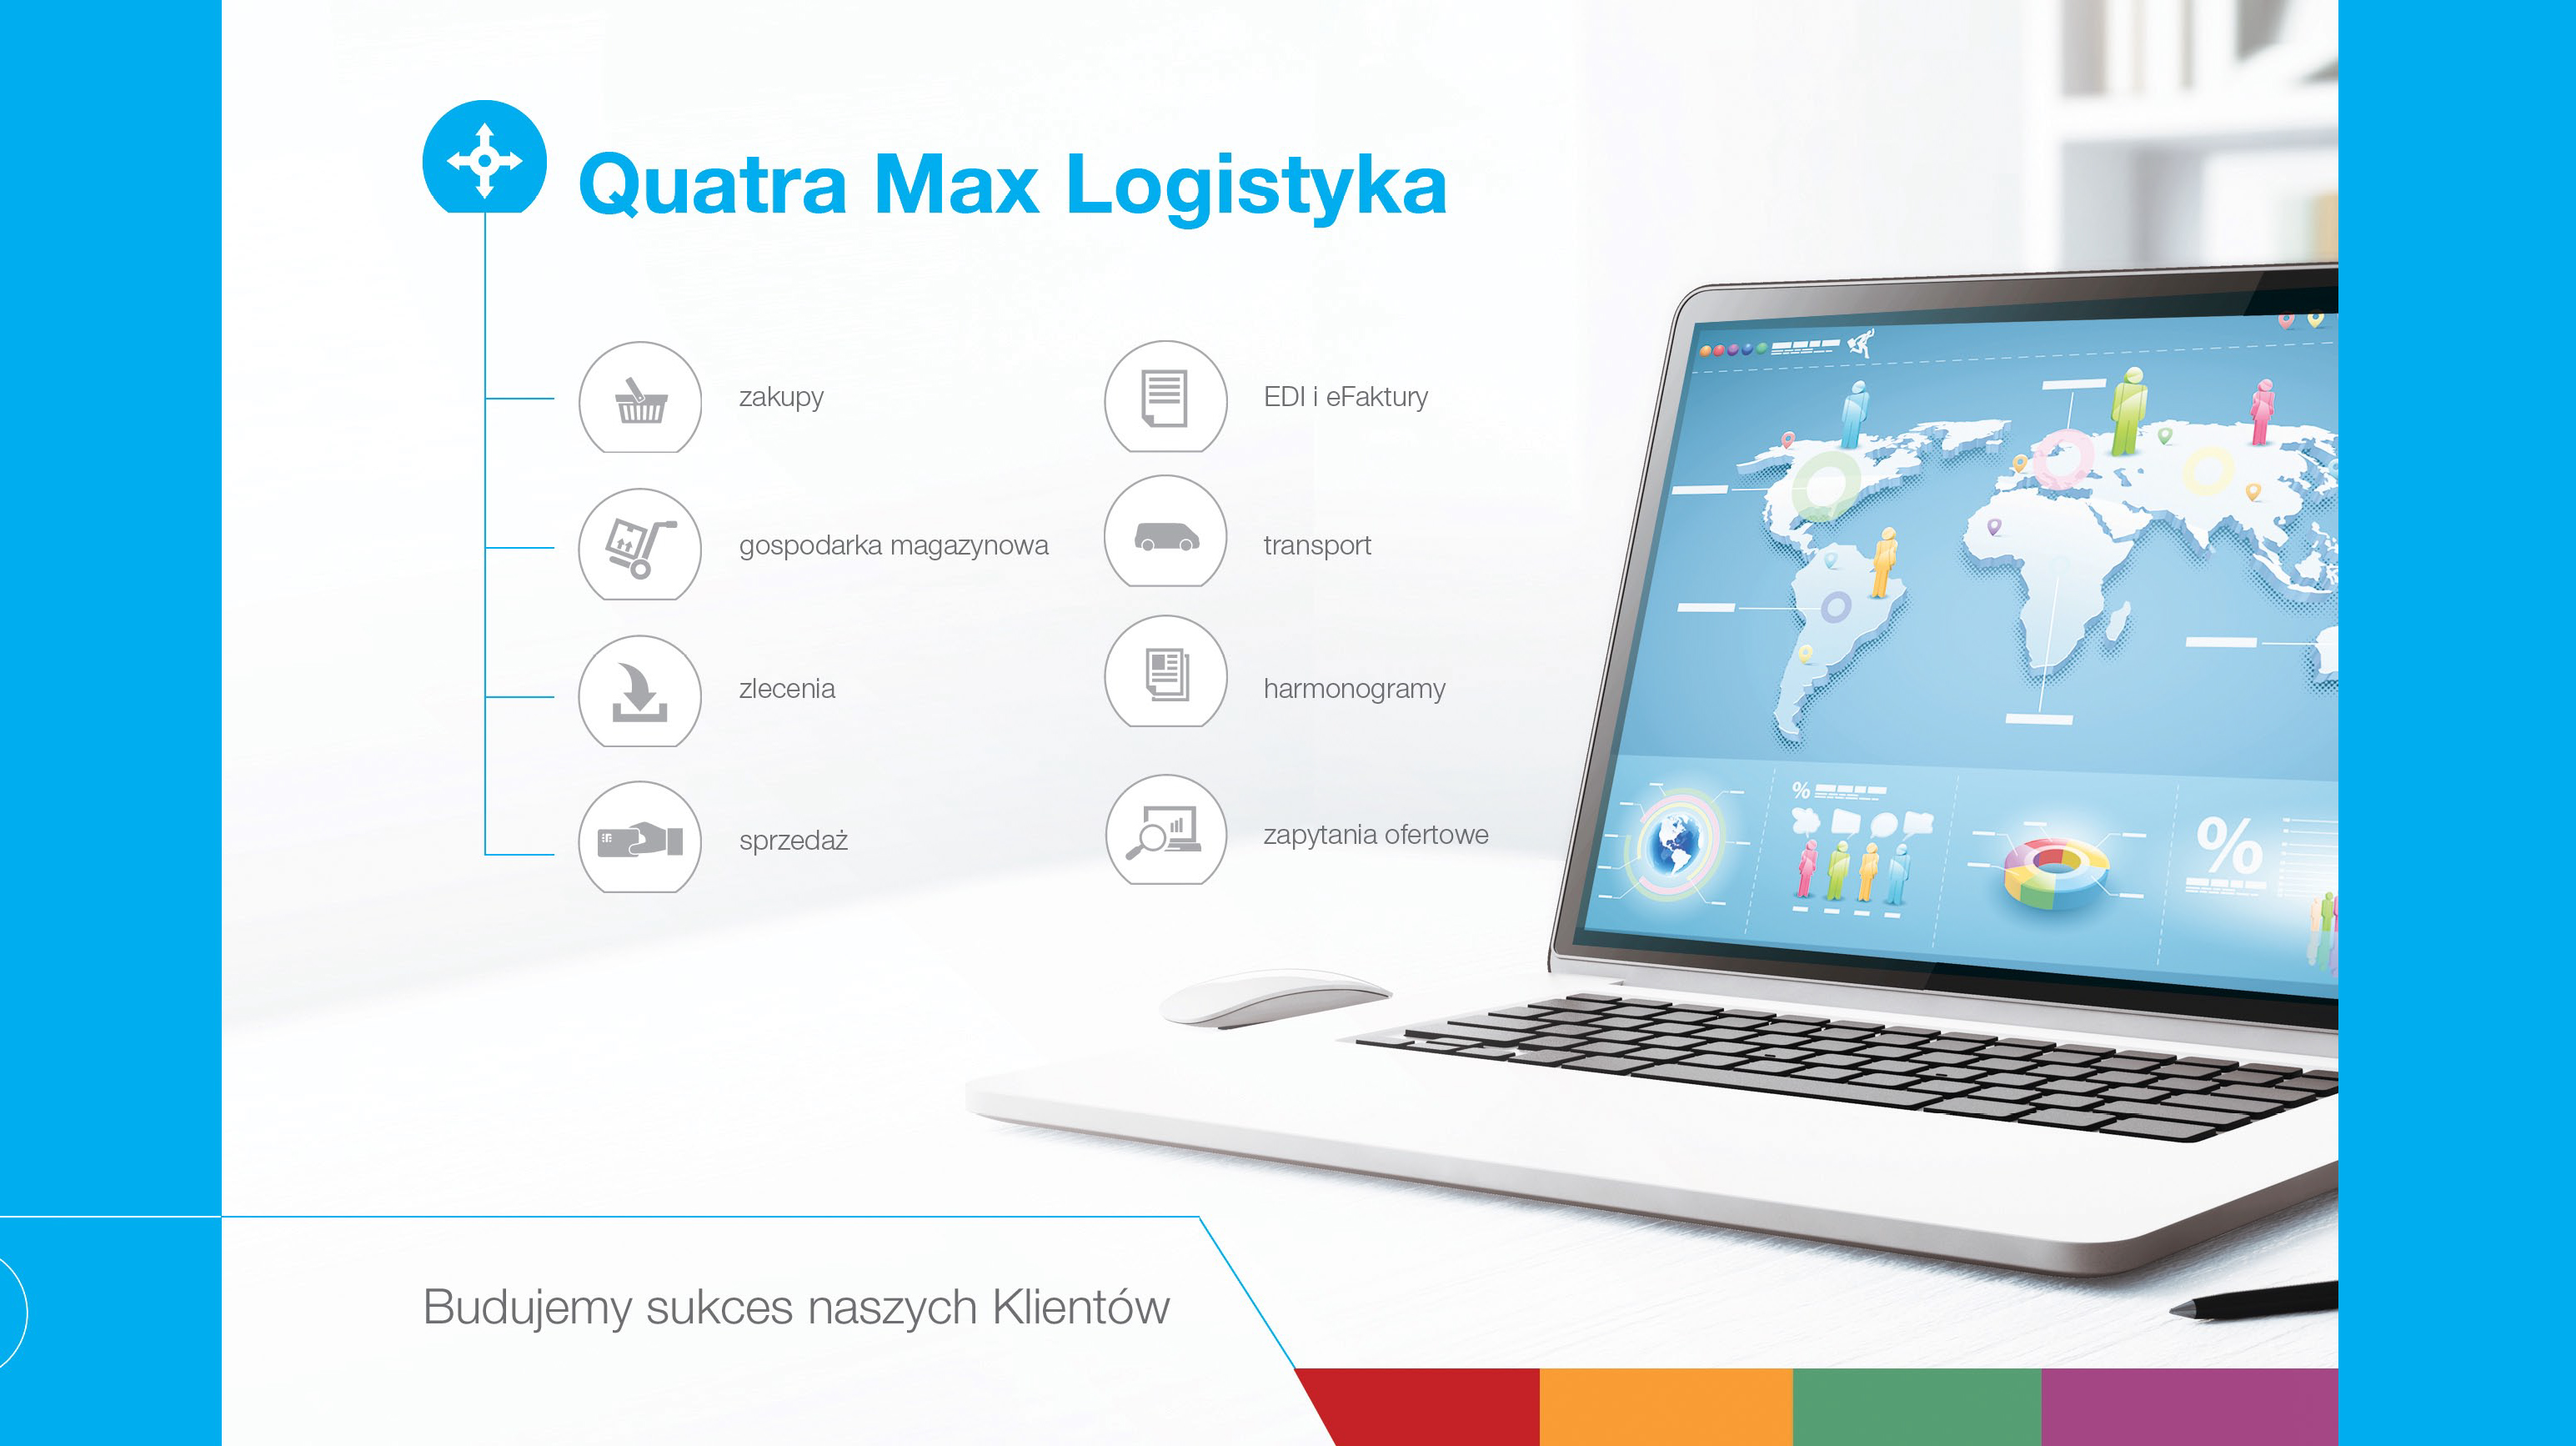 Logistyka Quatra Max